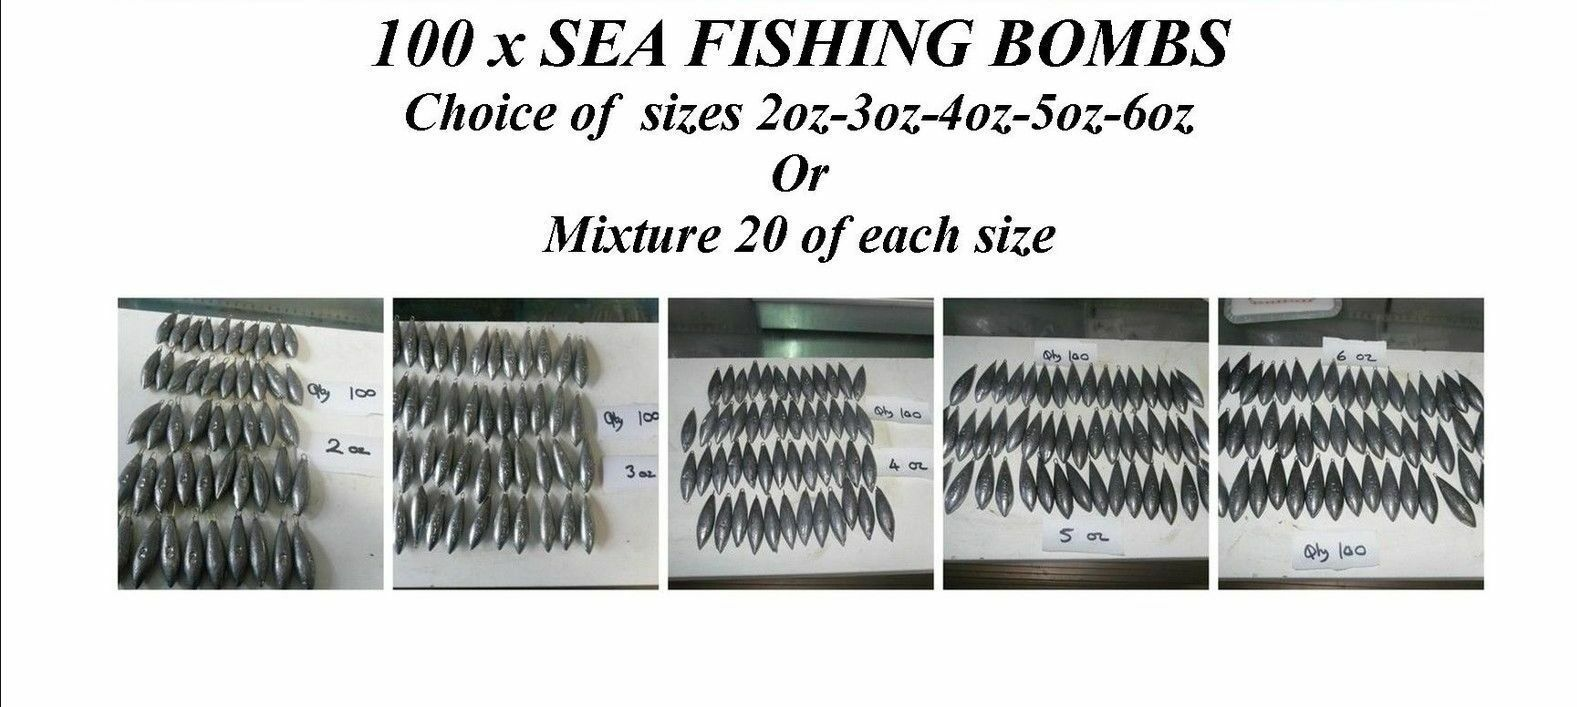 100 x SEA FISHING  WEIGHTS BEACH BOMB 2oz-3oz-4oz-5oz-6oz